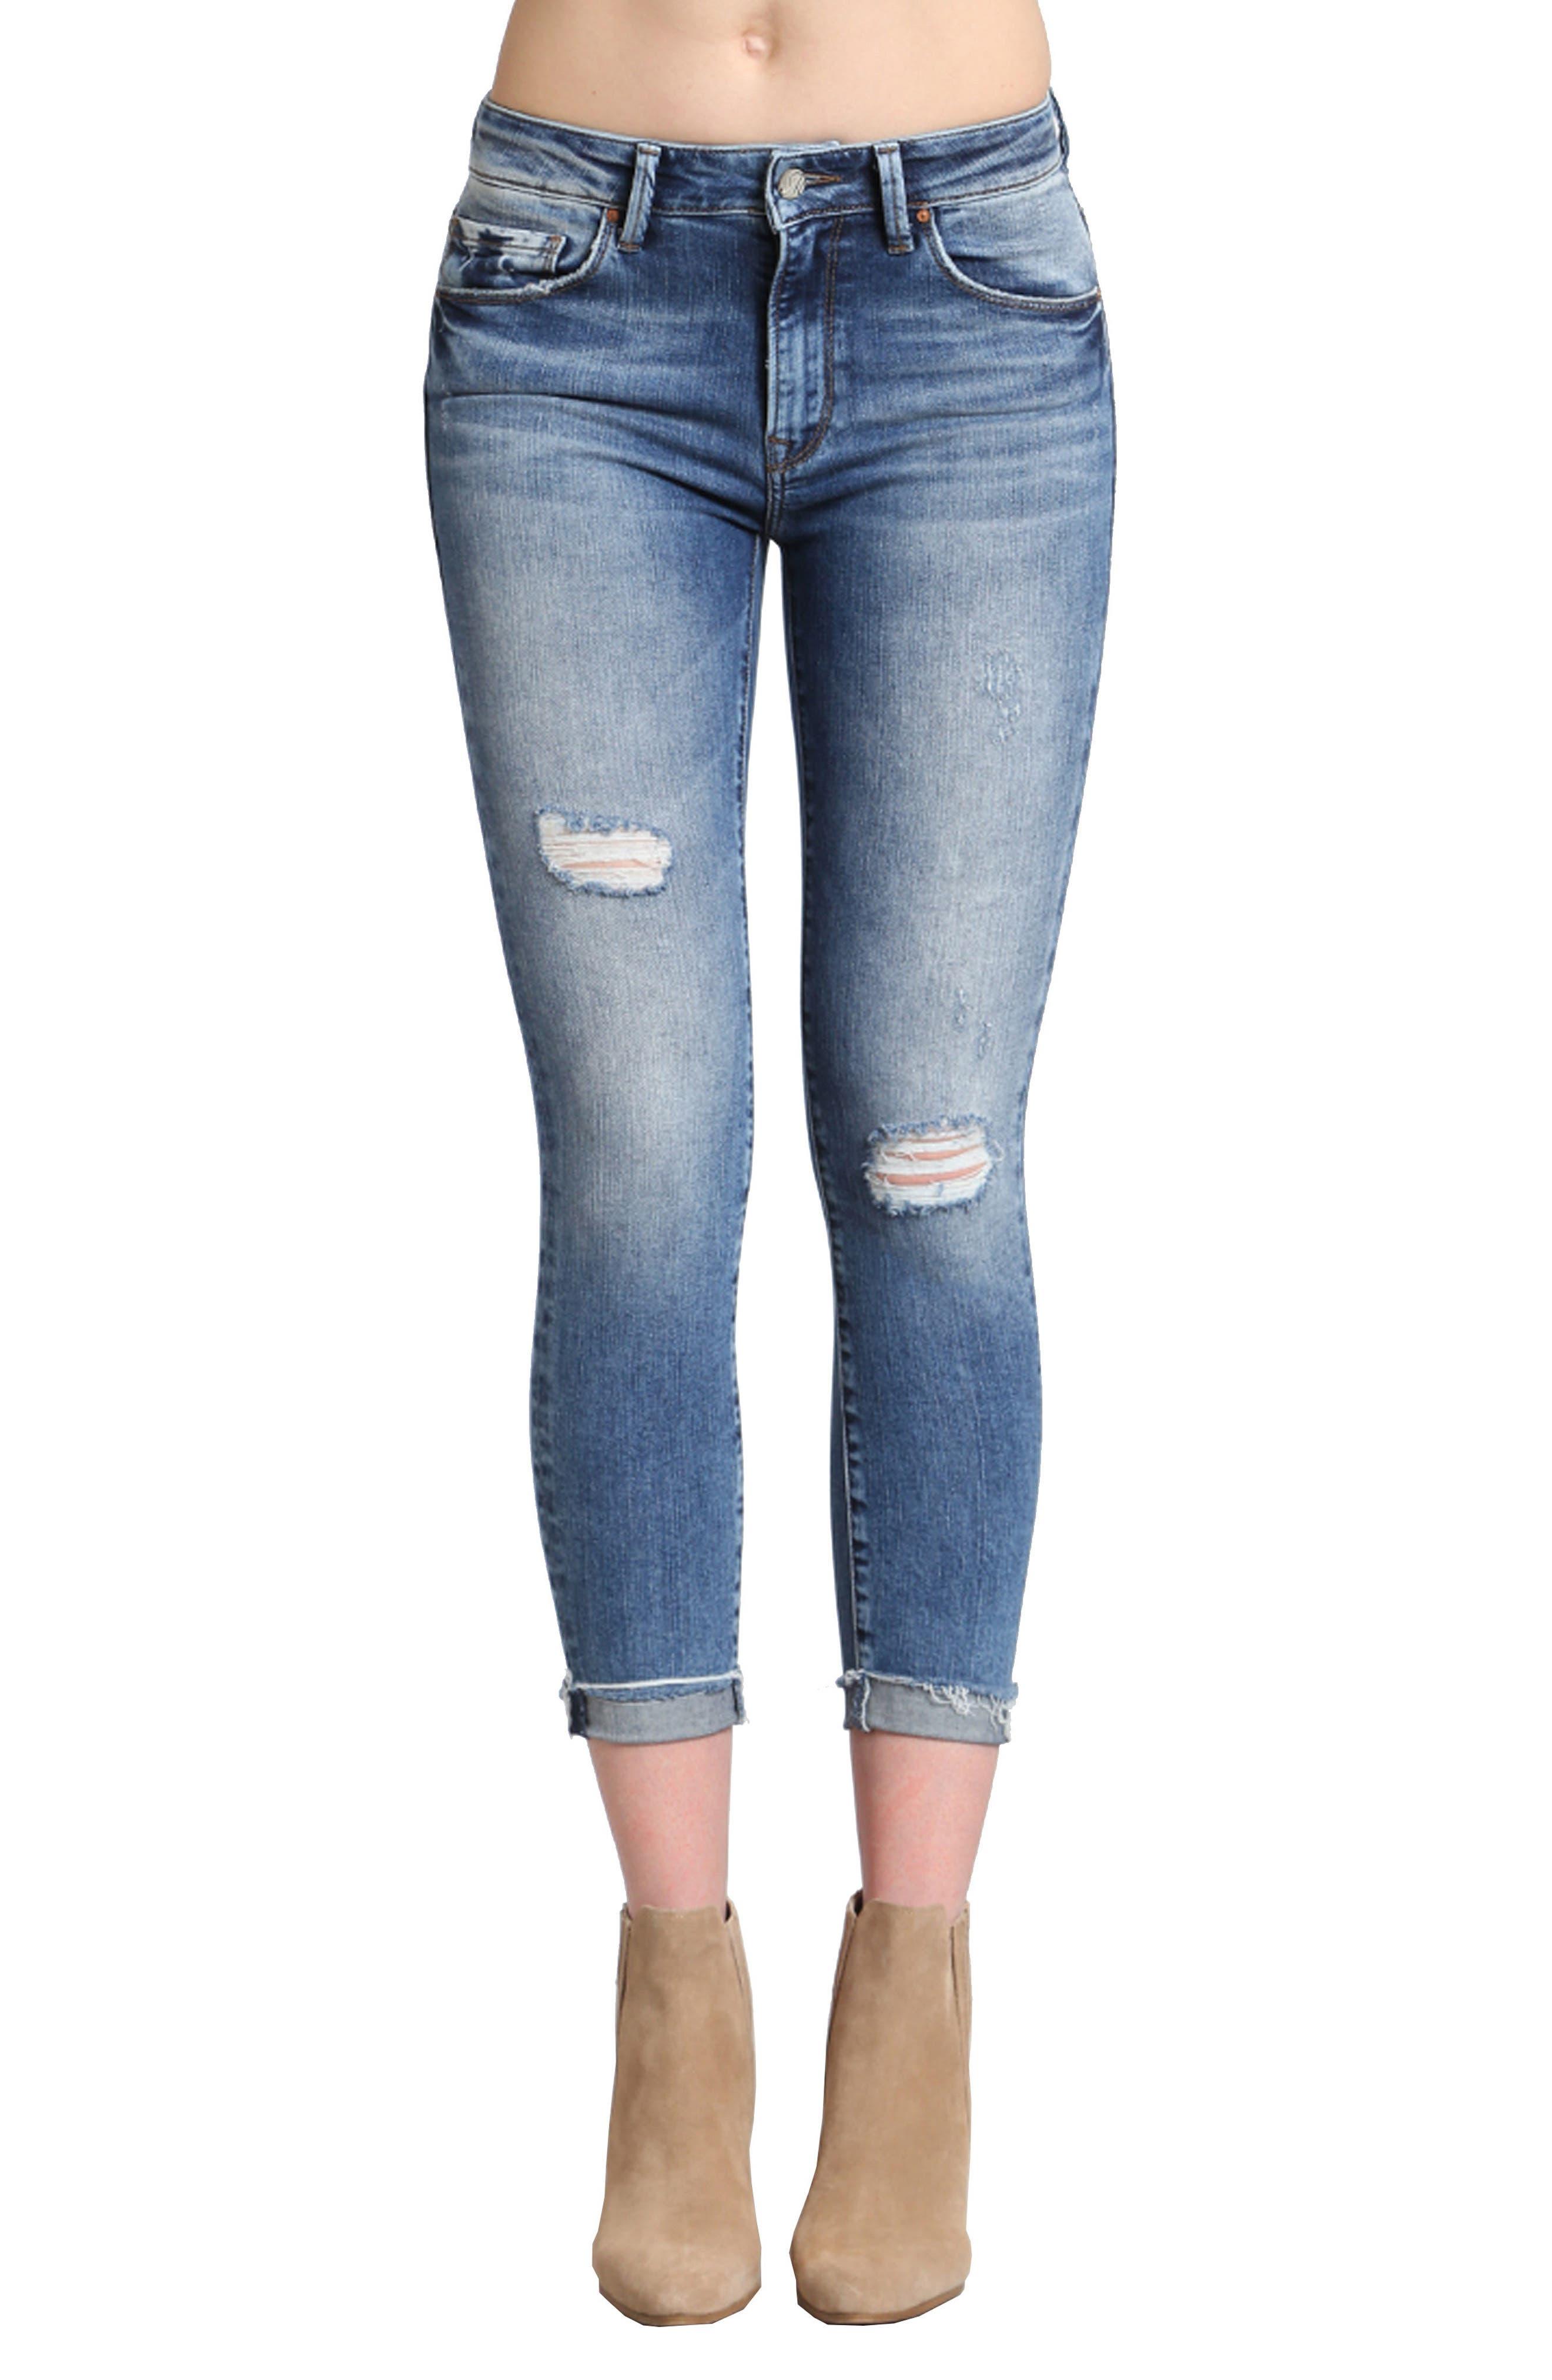 Tess Ripped Skinny Jeans,                             Main thumbnail 1, color,                             MID INDIGO VINTAGE